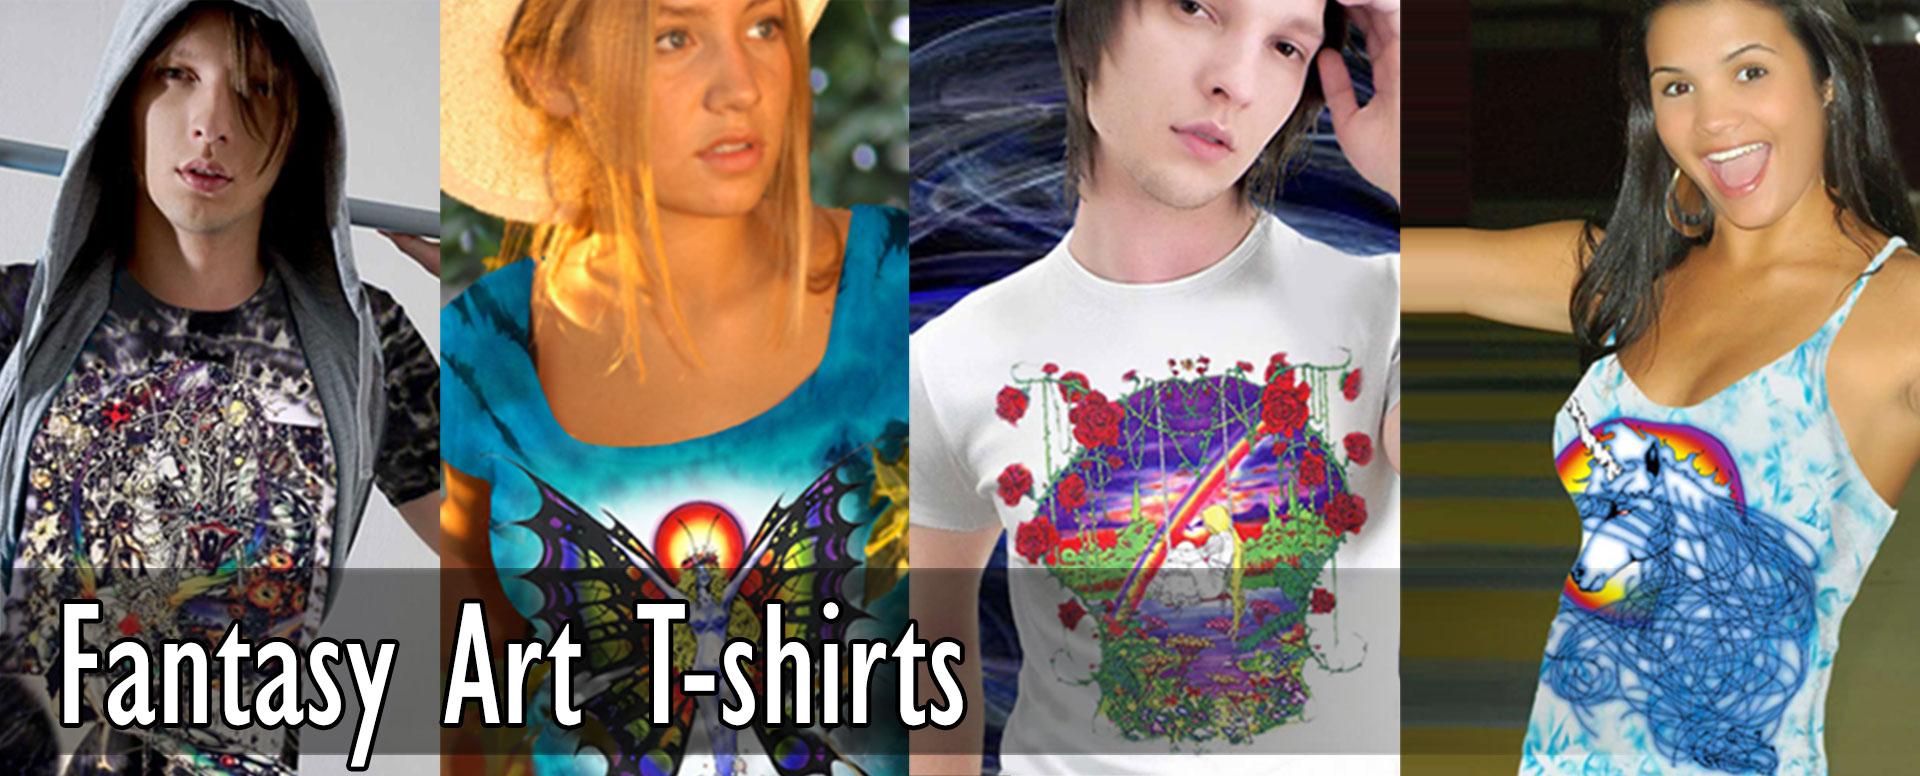 Fantasy Art T-shirts, Science Fiction Tees and Tank Tops